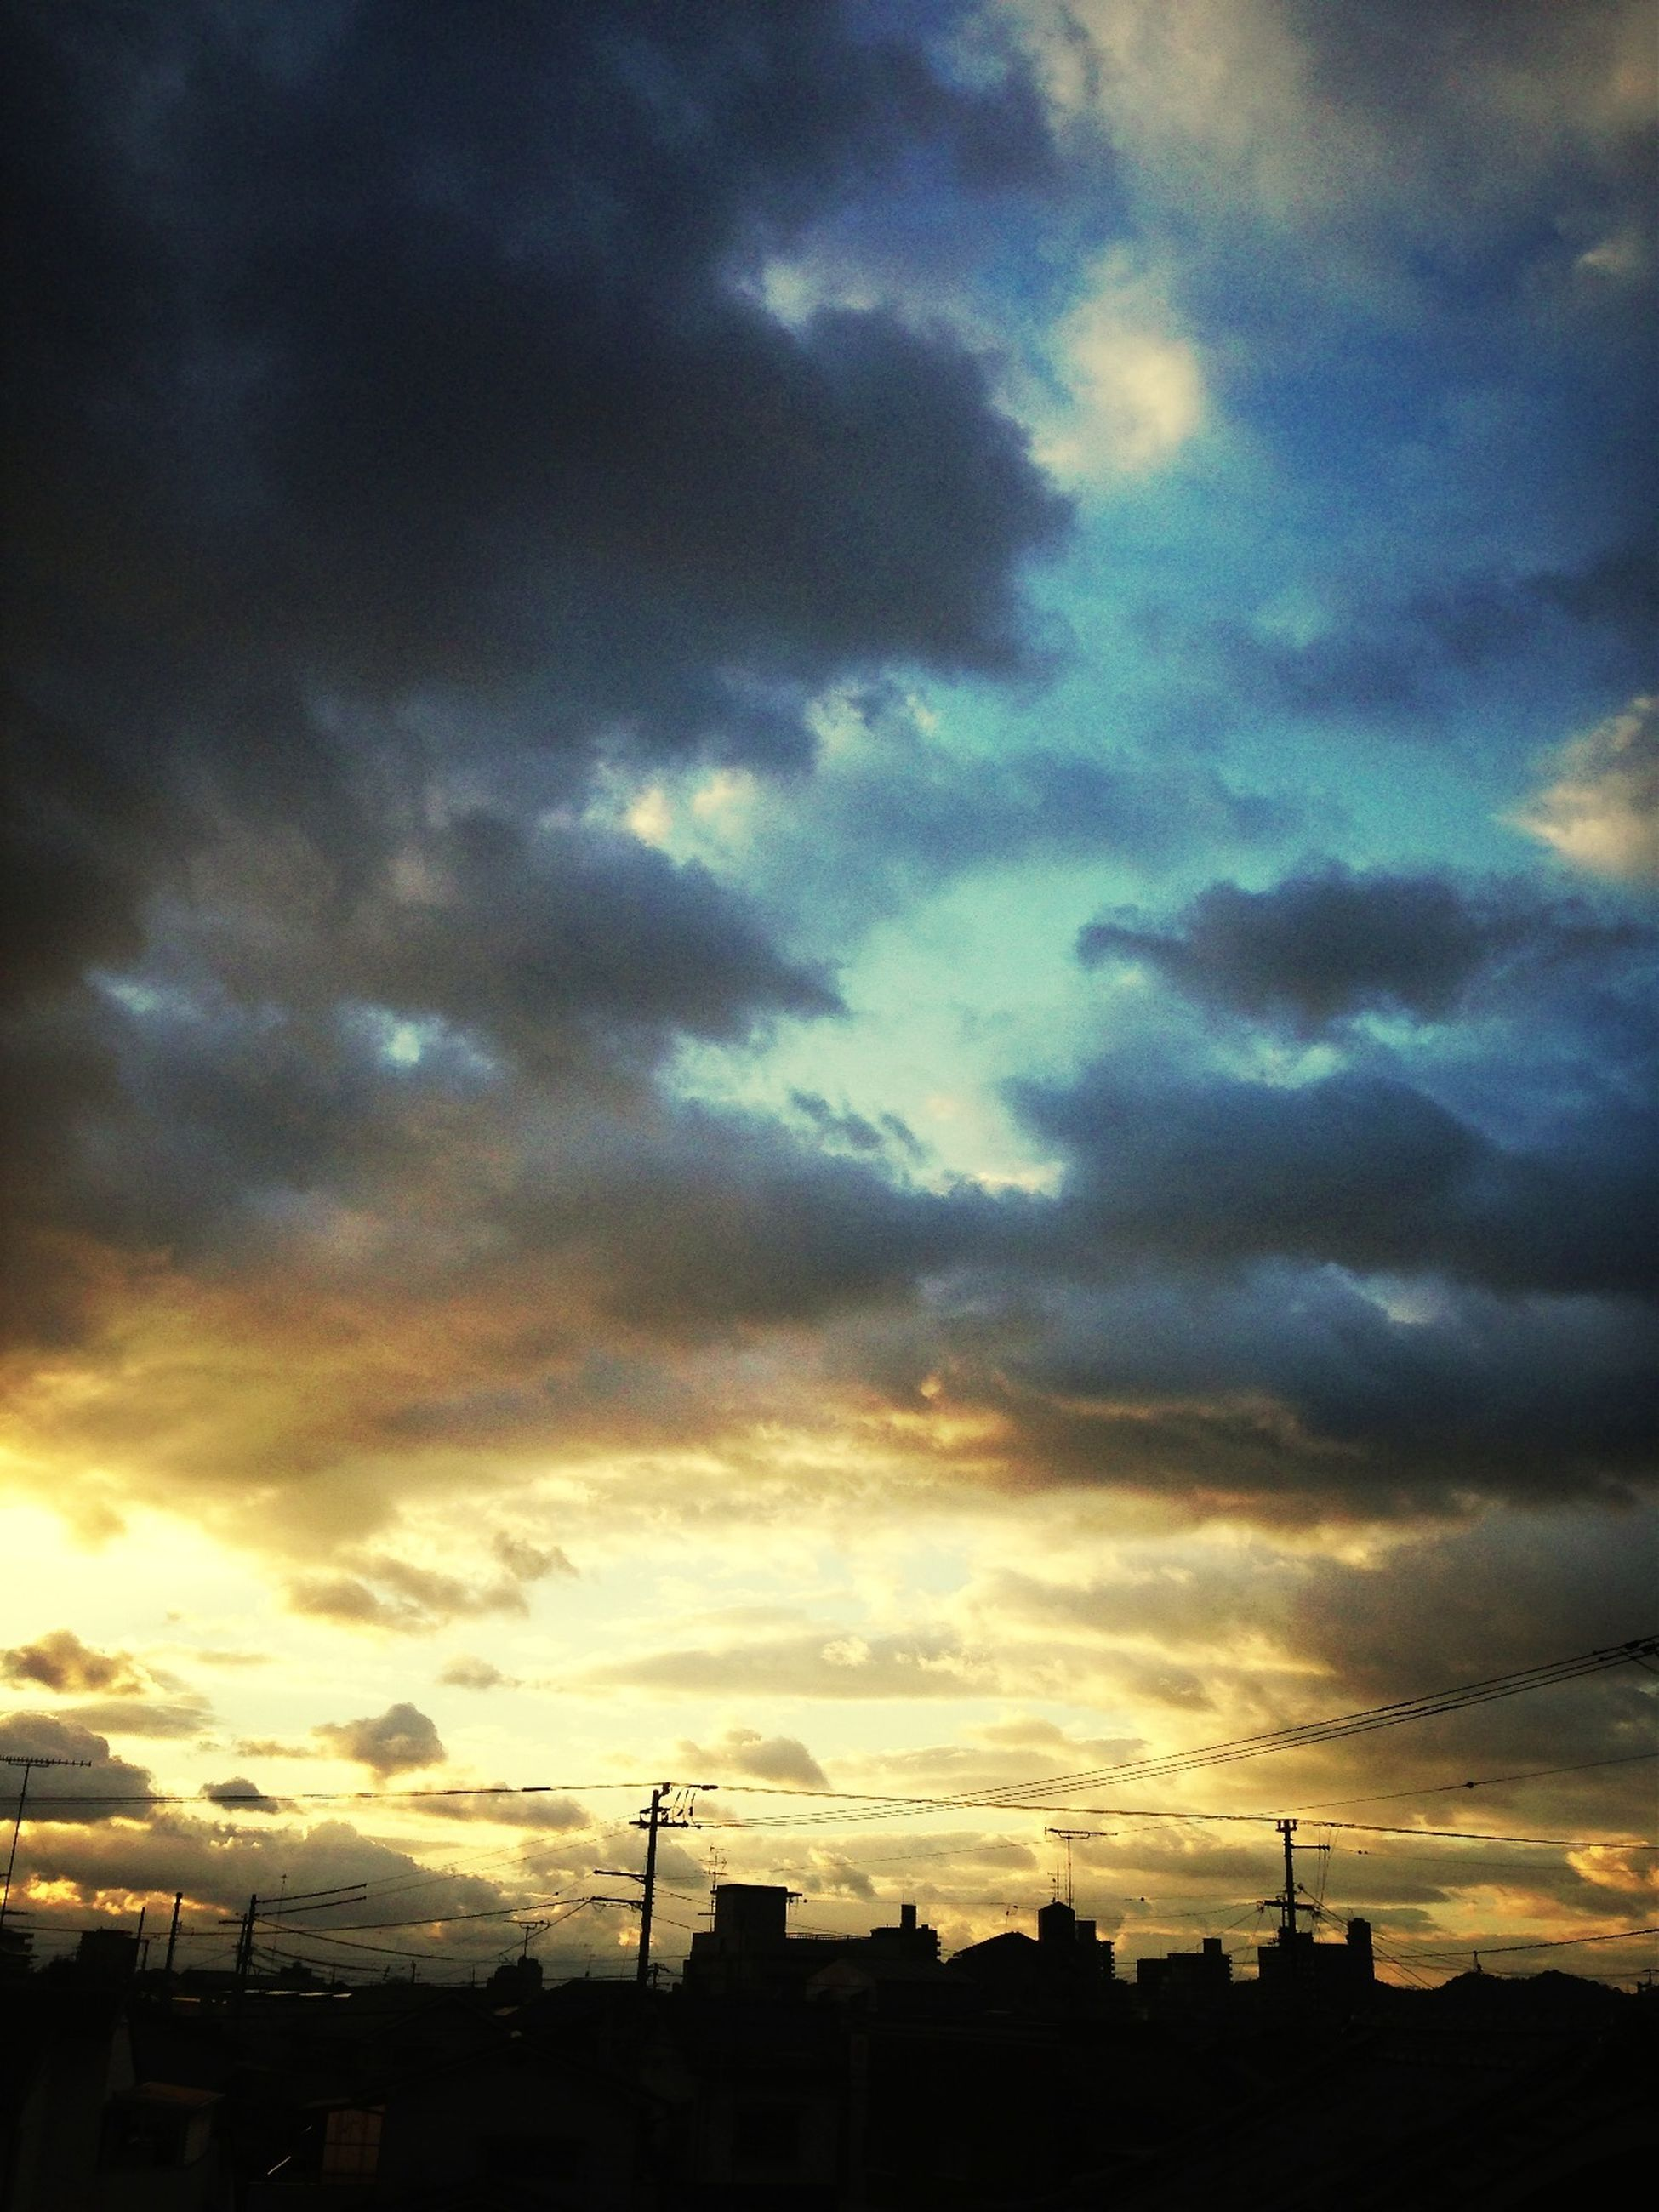 transportation, sky, sunset, mode of transport, cloud - sky, nautical vessel, cloudy, dusk, water, harbor, nature, built structure, cloud, scenics, moored, building exterior, outdoors, city, sea, street light